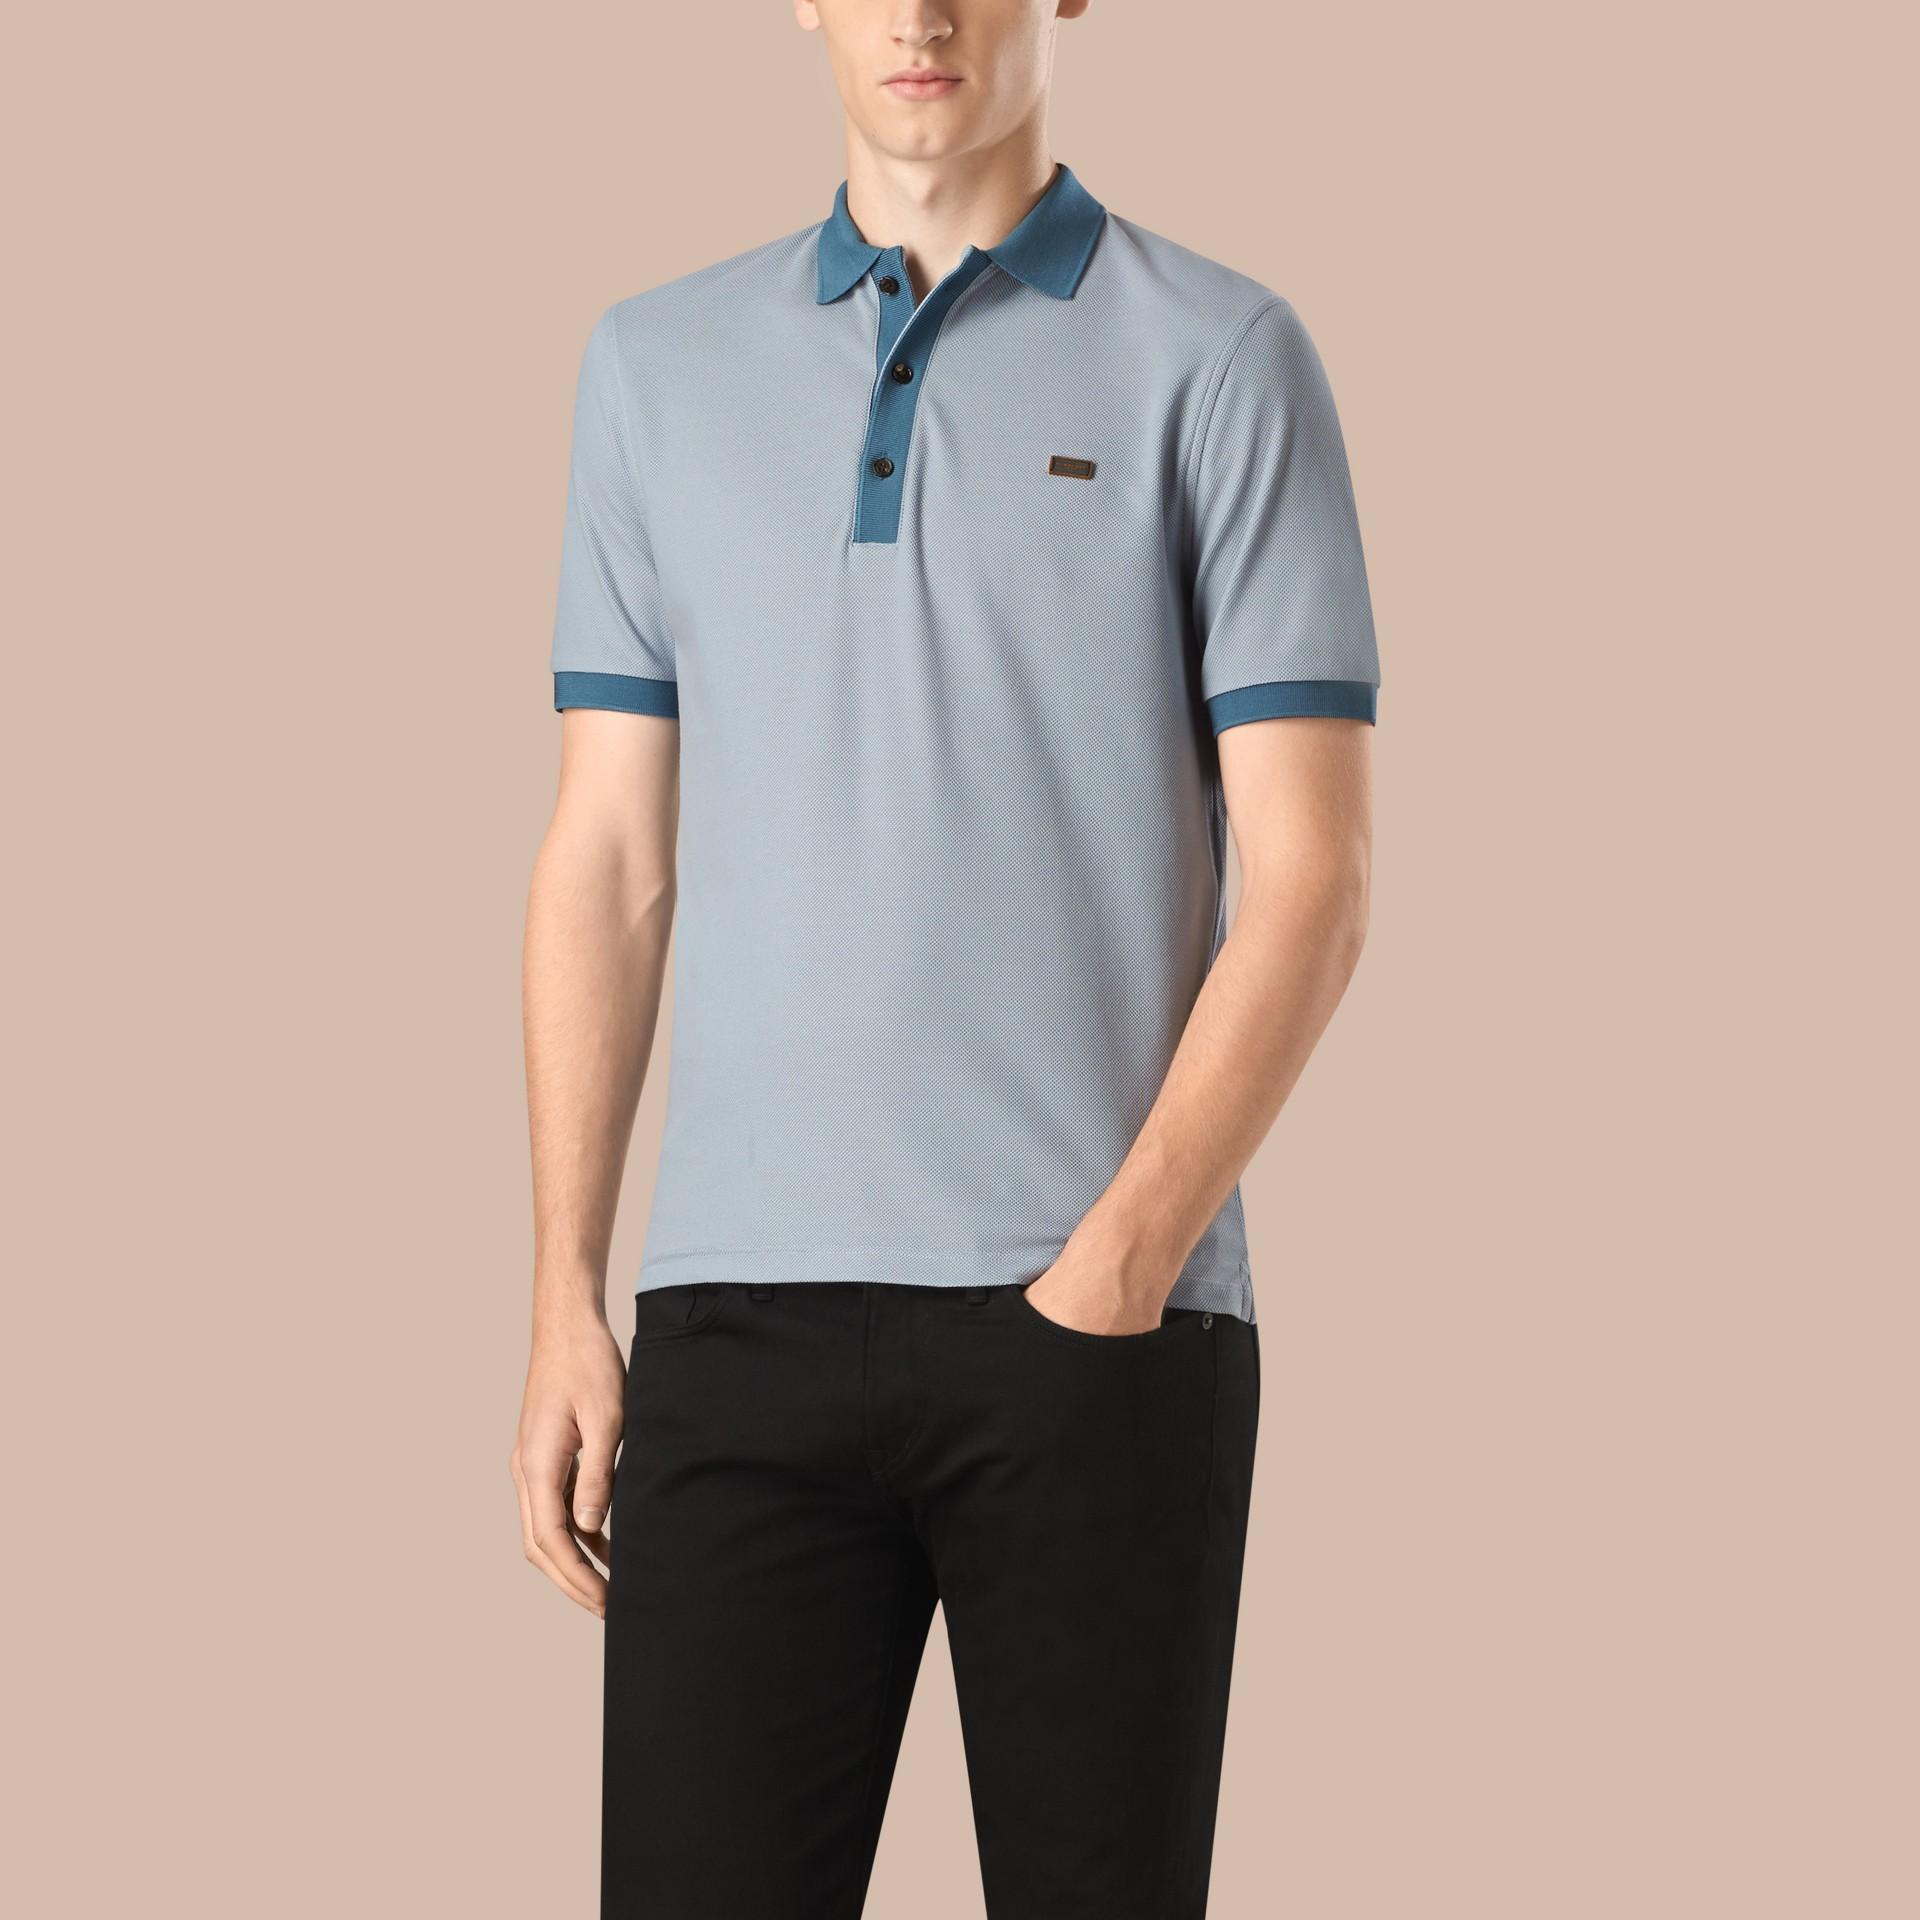 Helles himmelblau/lupinenblau Poloshirt aus mercerisiertem Baumwollpiqué Helles Himmelblau/lupinenblau - Galerie-Bild 1